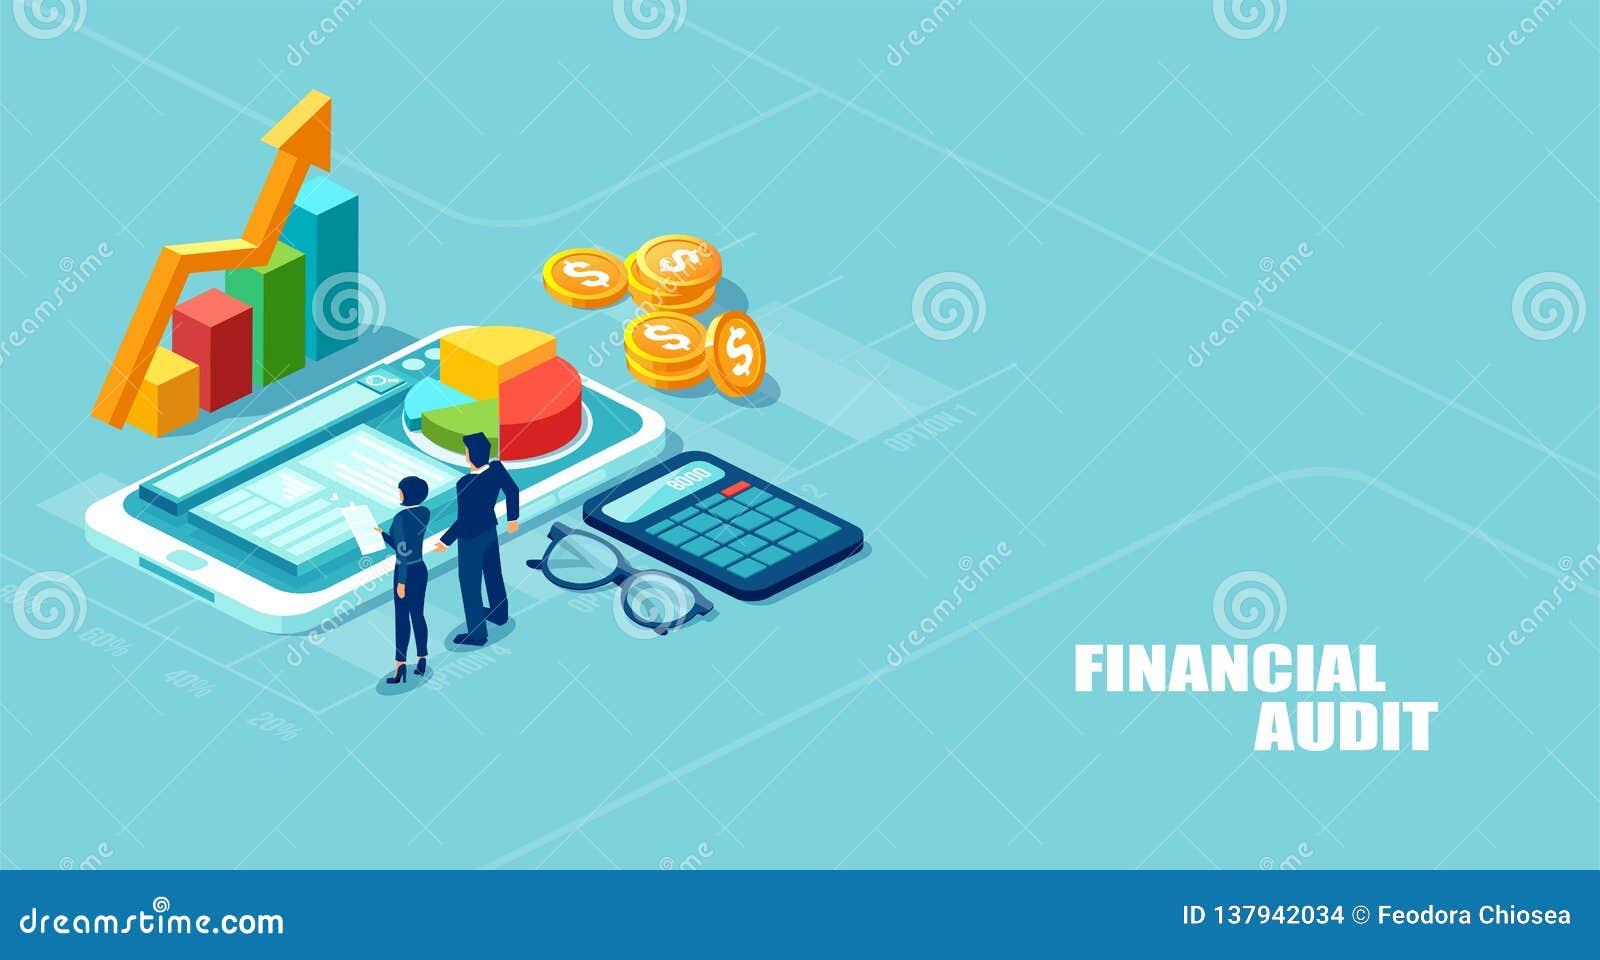 Isometric διανυσματική απεικόνιση του businesspeople που αναλύει την εταιρικά fianncial έκθεση και τα κέρδη